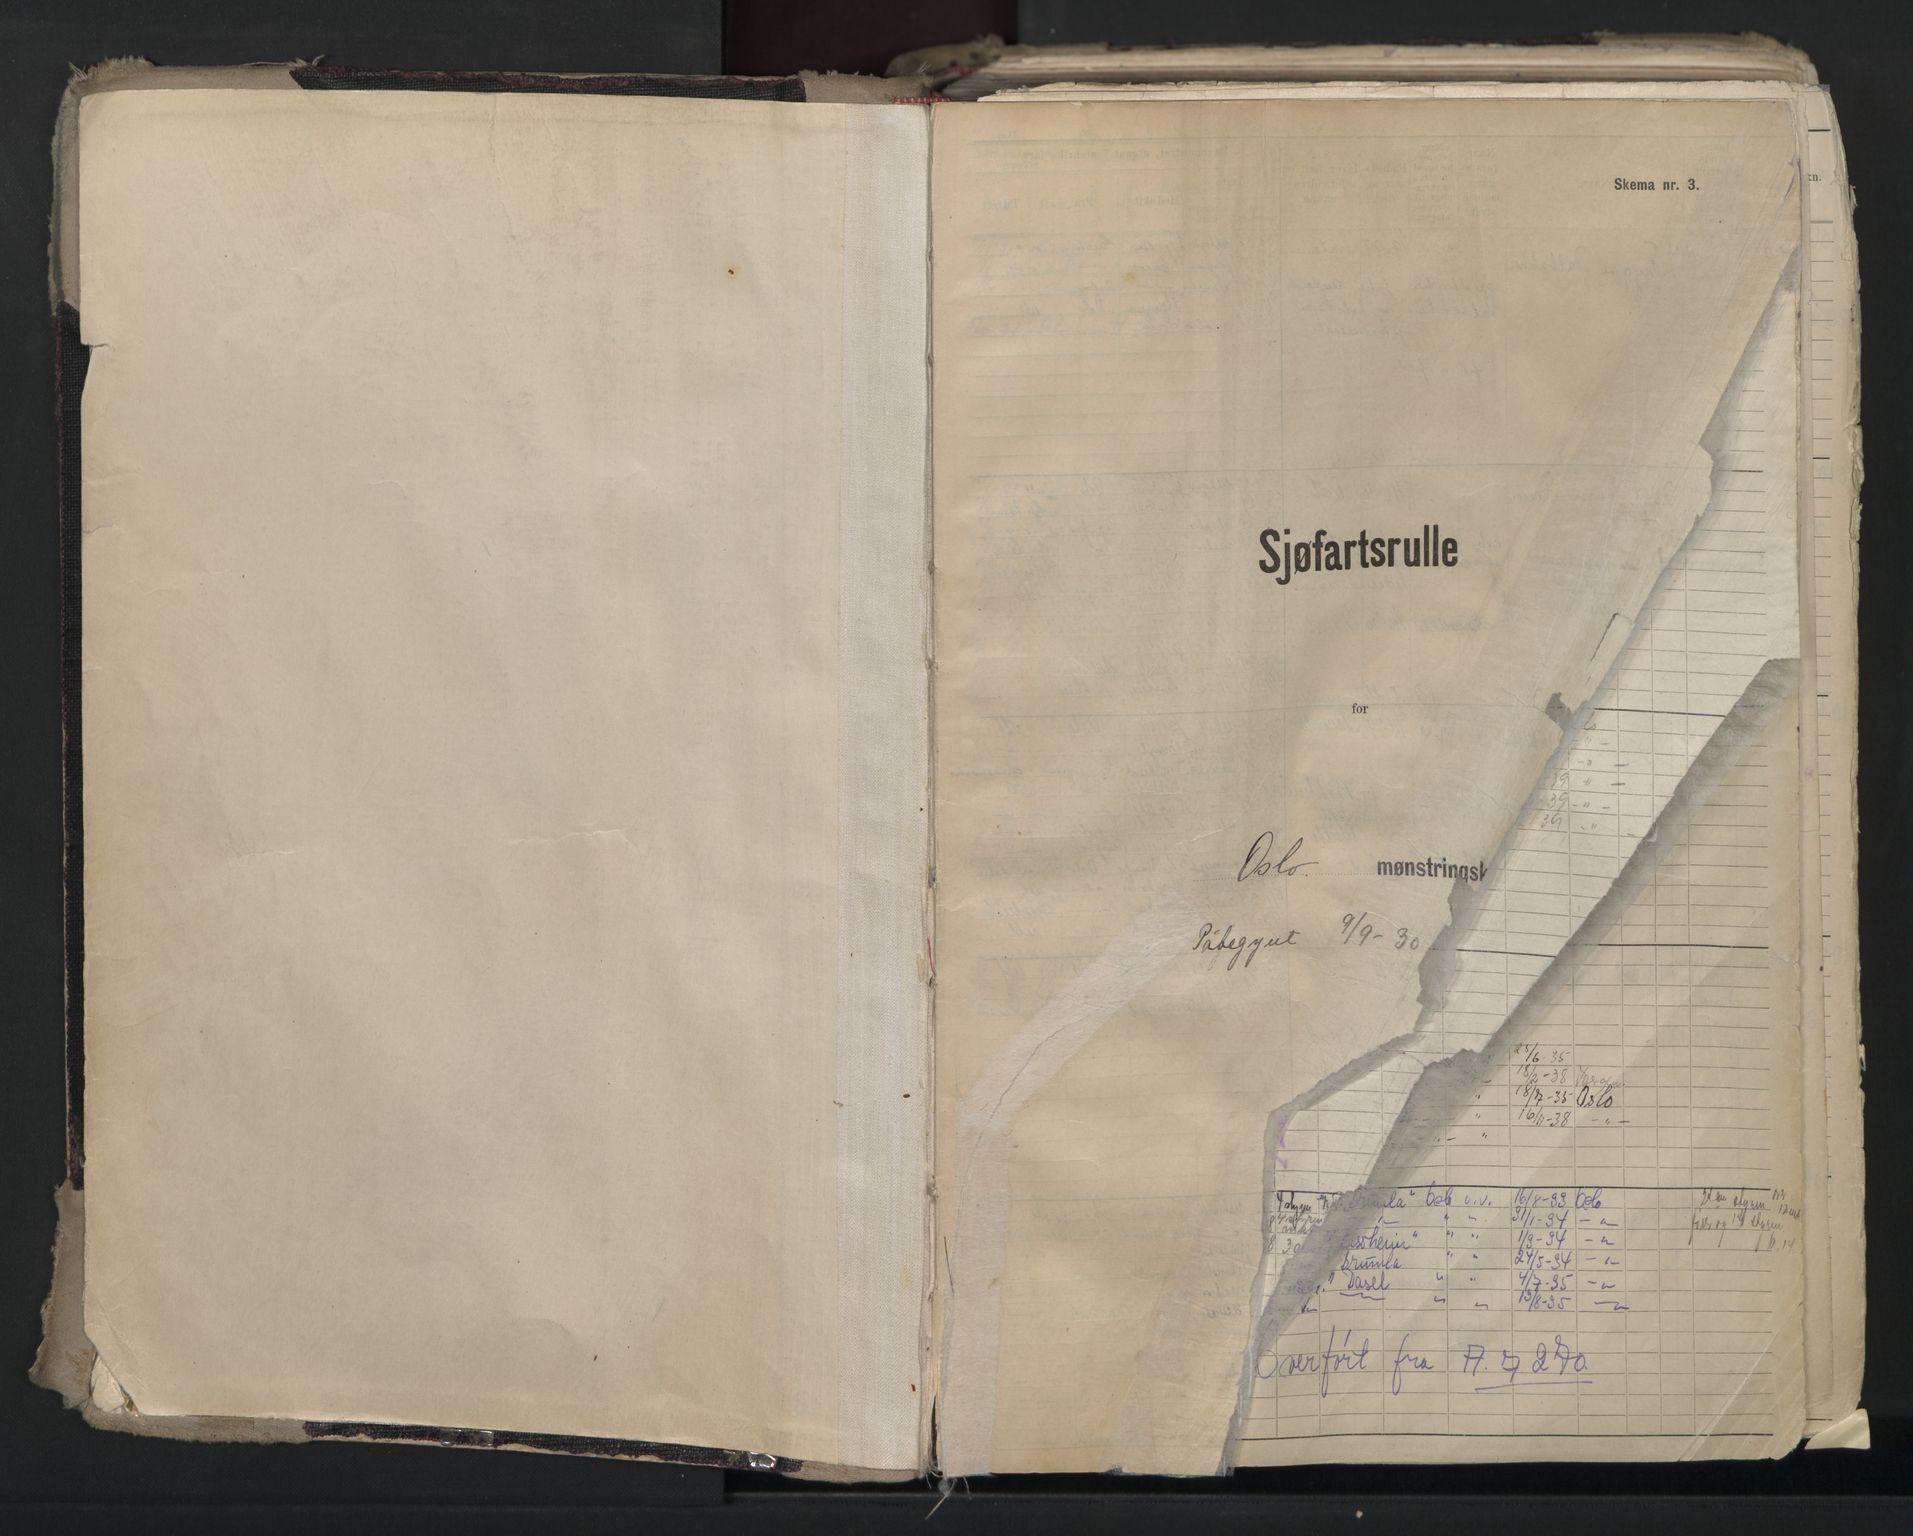 SAO, Oslo sjømannskontor, F/Fc/L0007: Hovedrulle, 1930-1948, s. 3